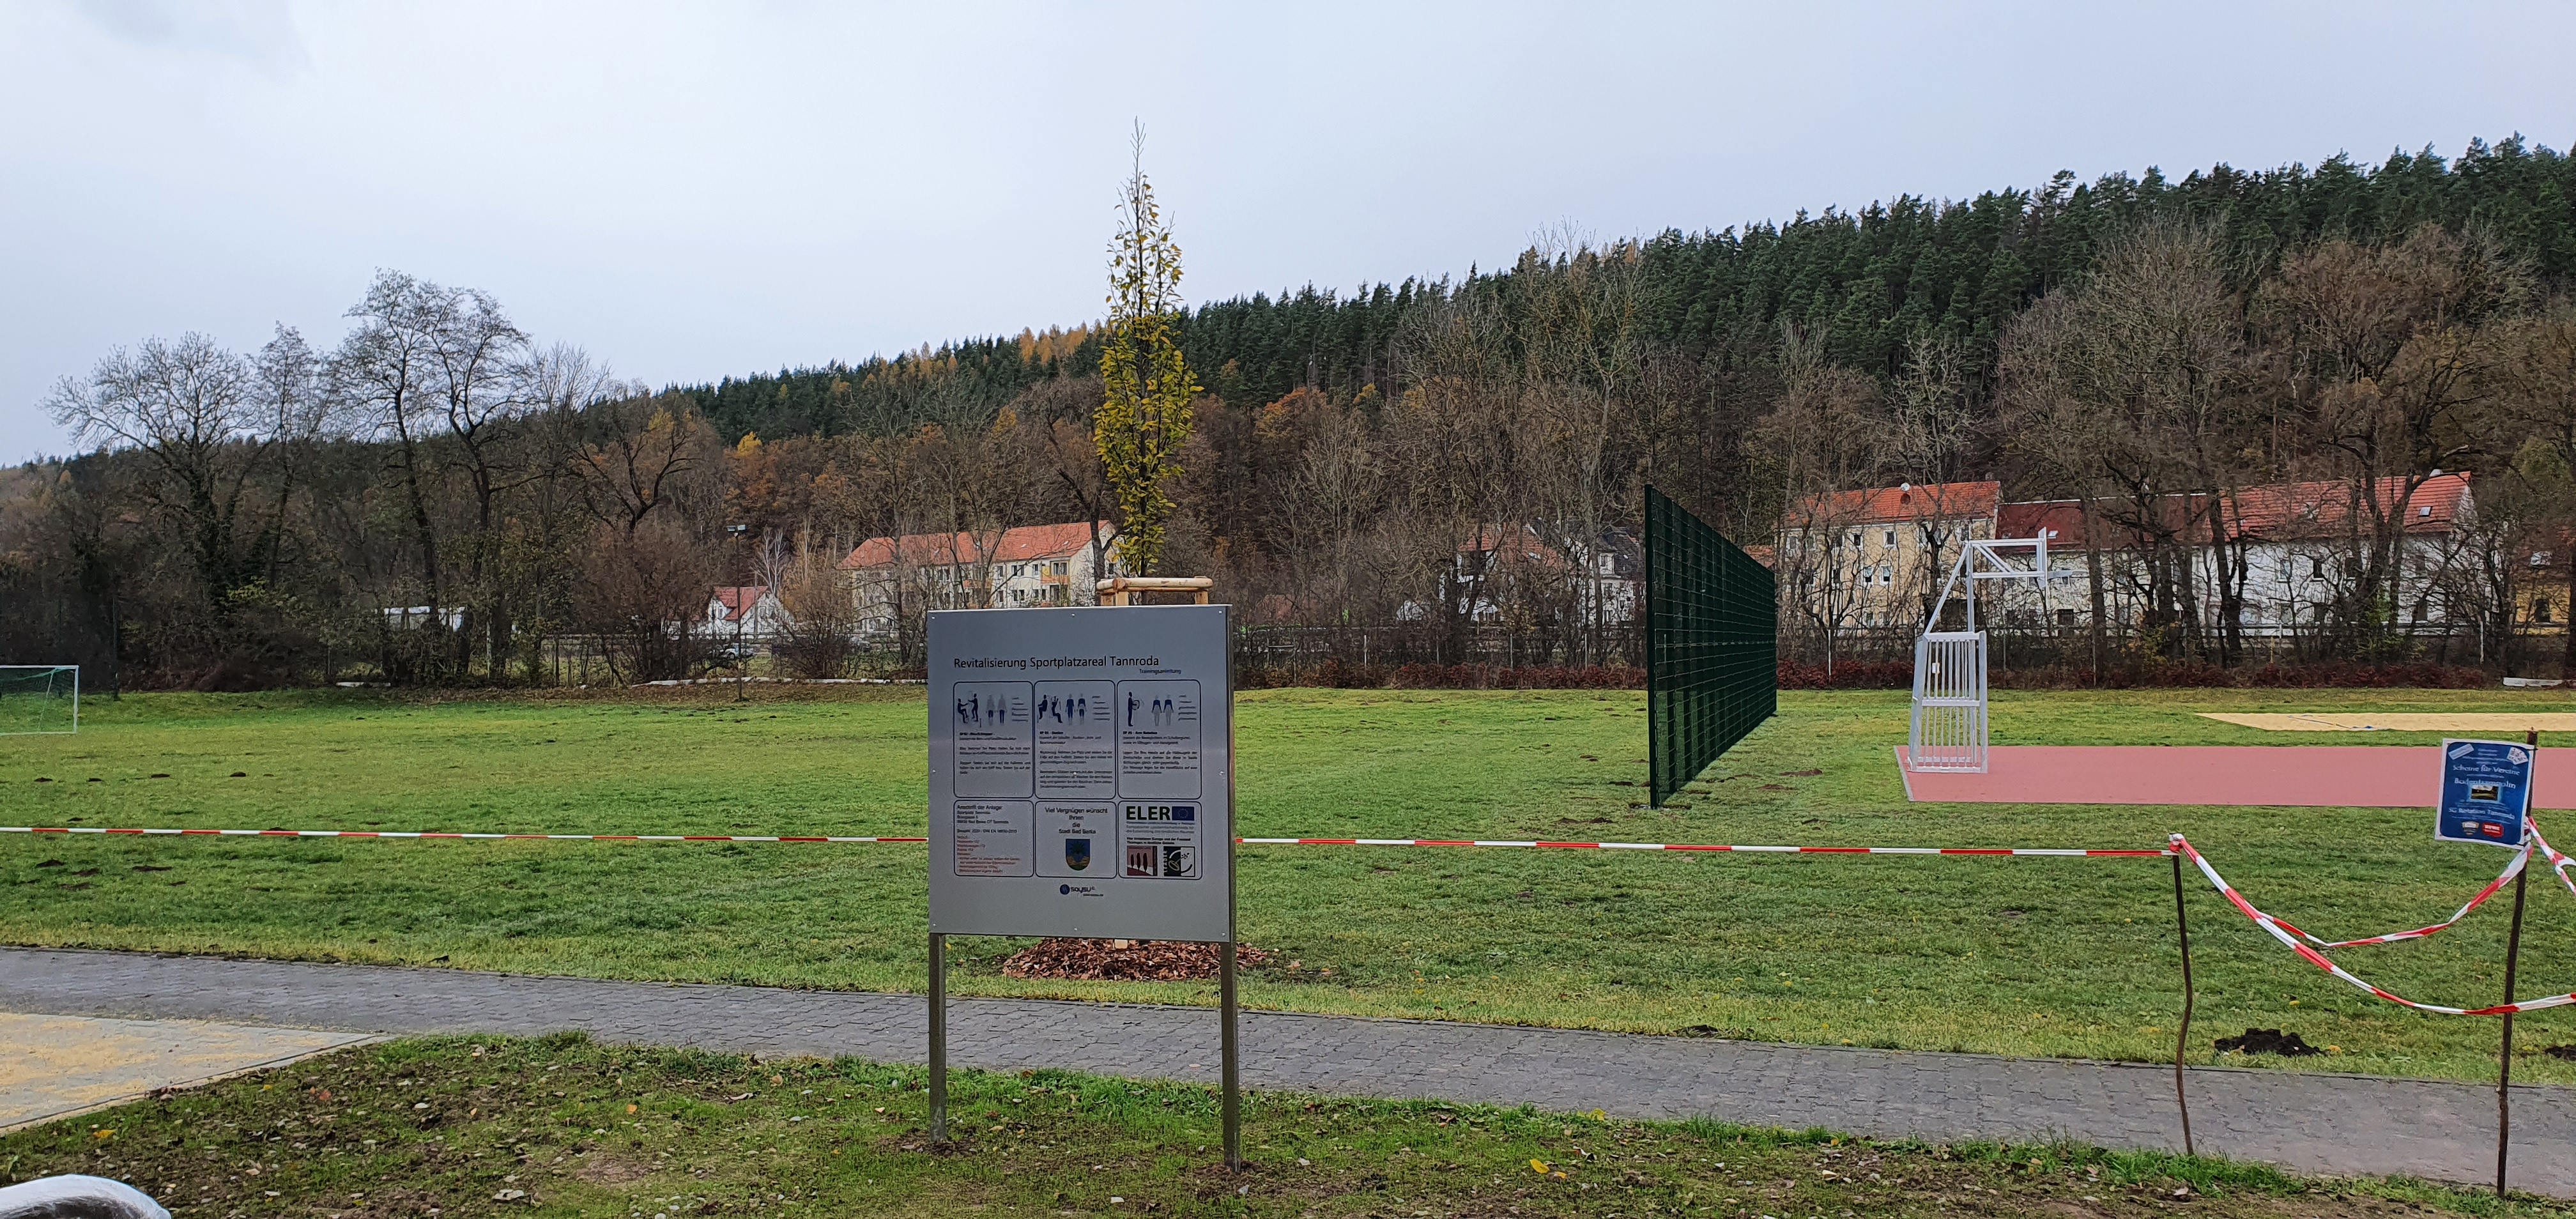 Revitalisierung ehemaliges Sportplatzareal Tannroda, RAG Weimarer Land - Mittelthüringen e.V.